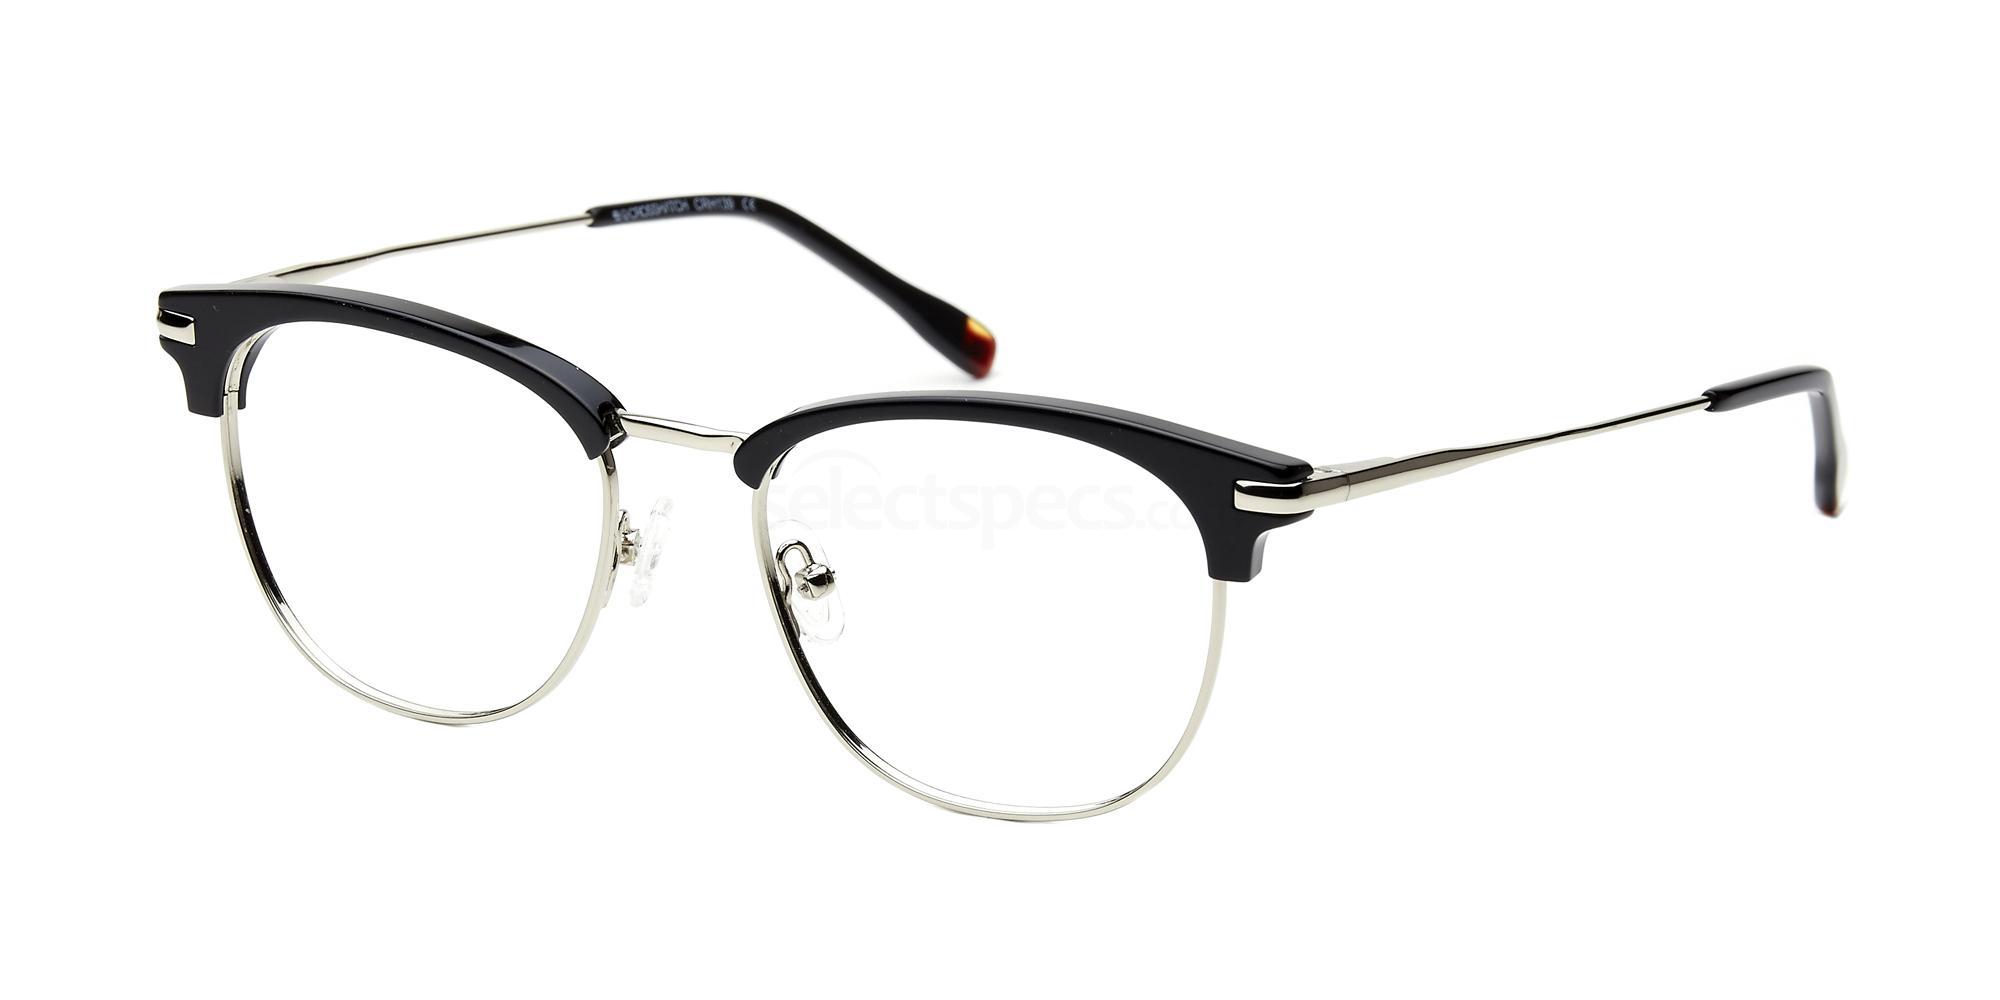 C1 CRH139 Glasses, Crosshatch